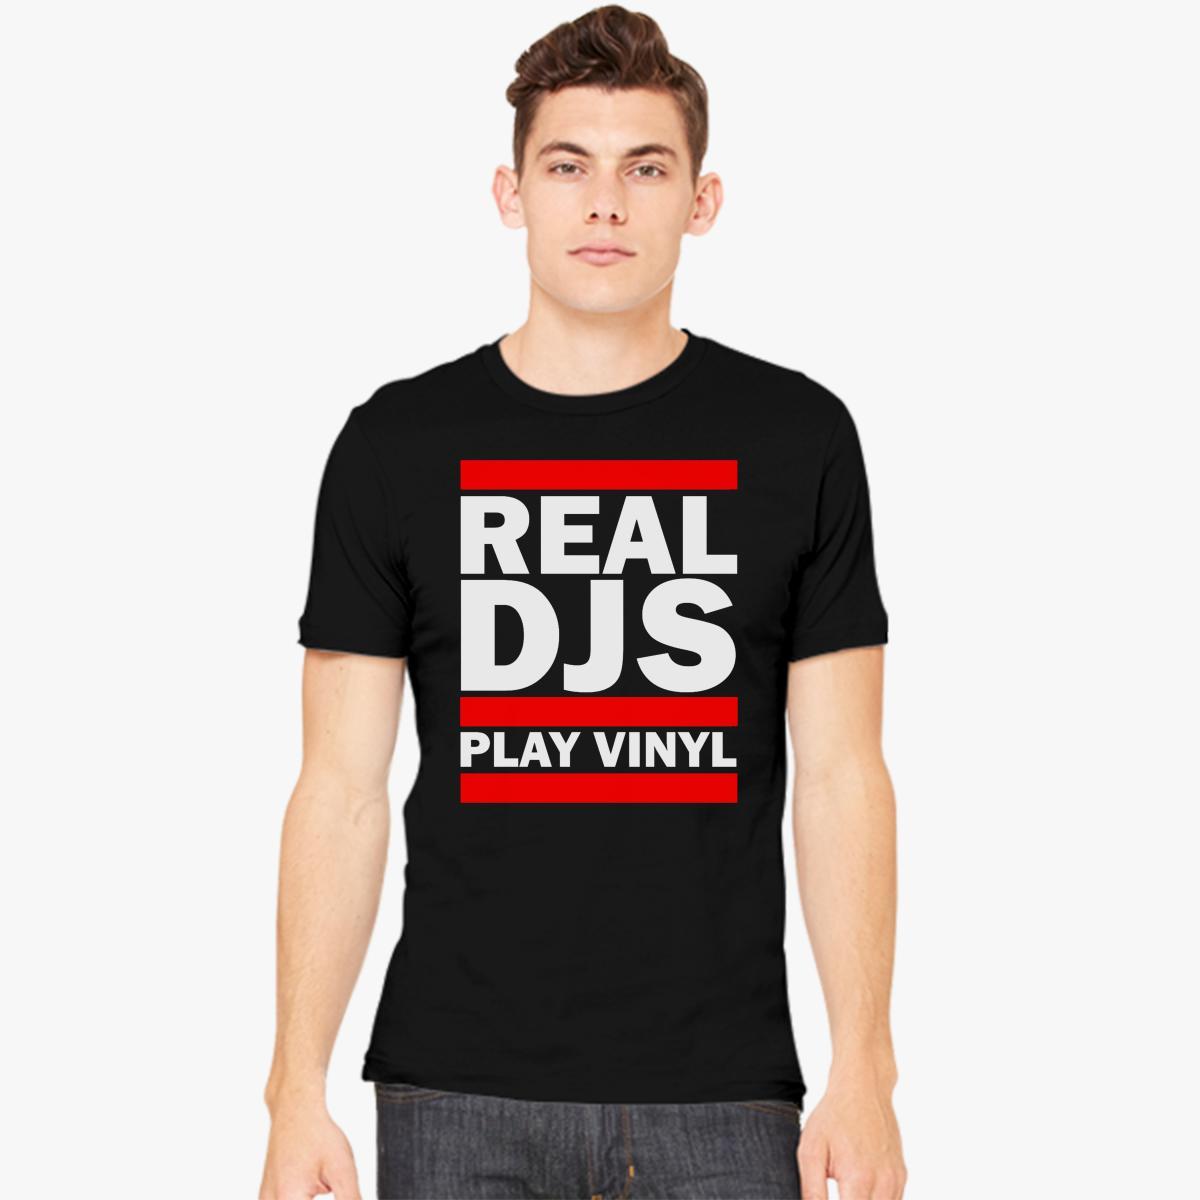 REAL DJS PLAY VINYL Men's T-shirt model